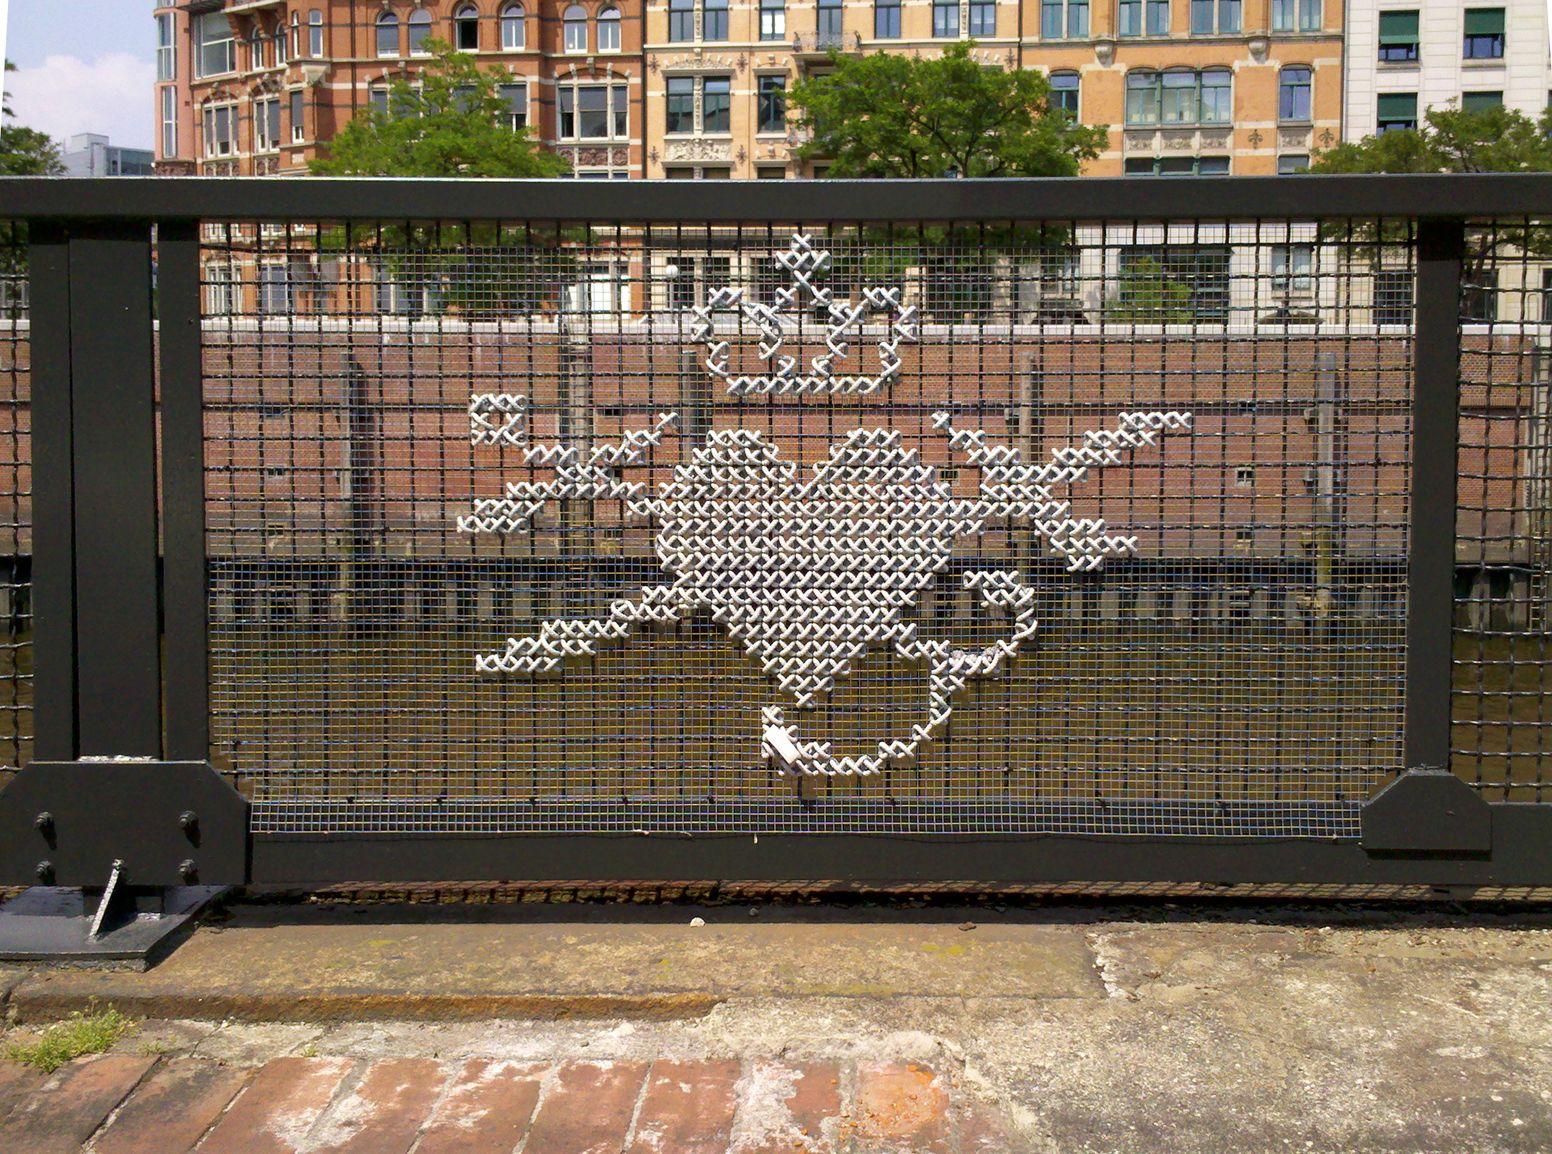 Resultado de imagen para punto de cruz arte urbano